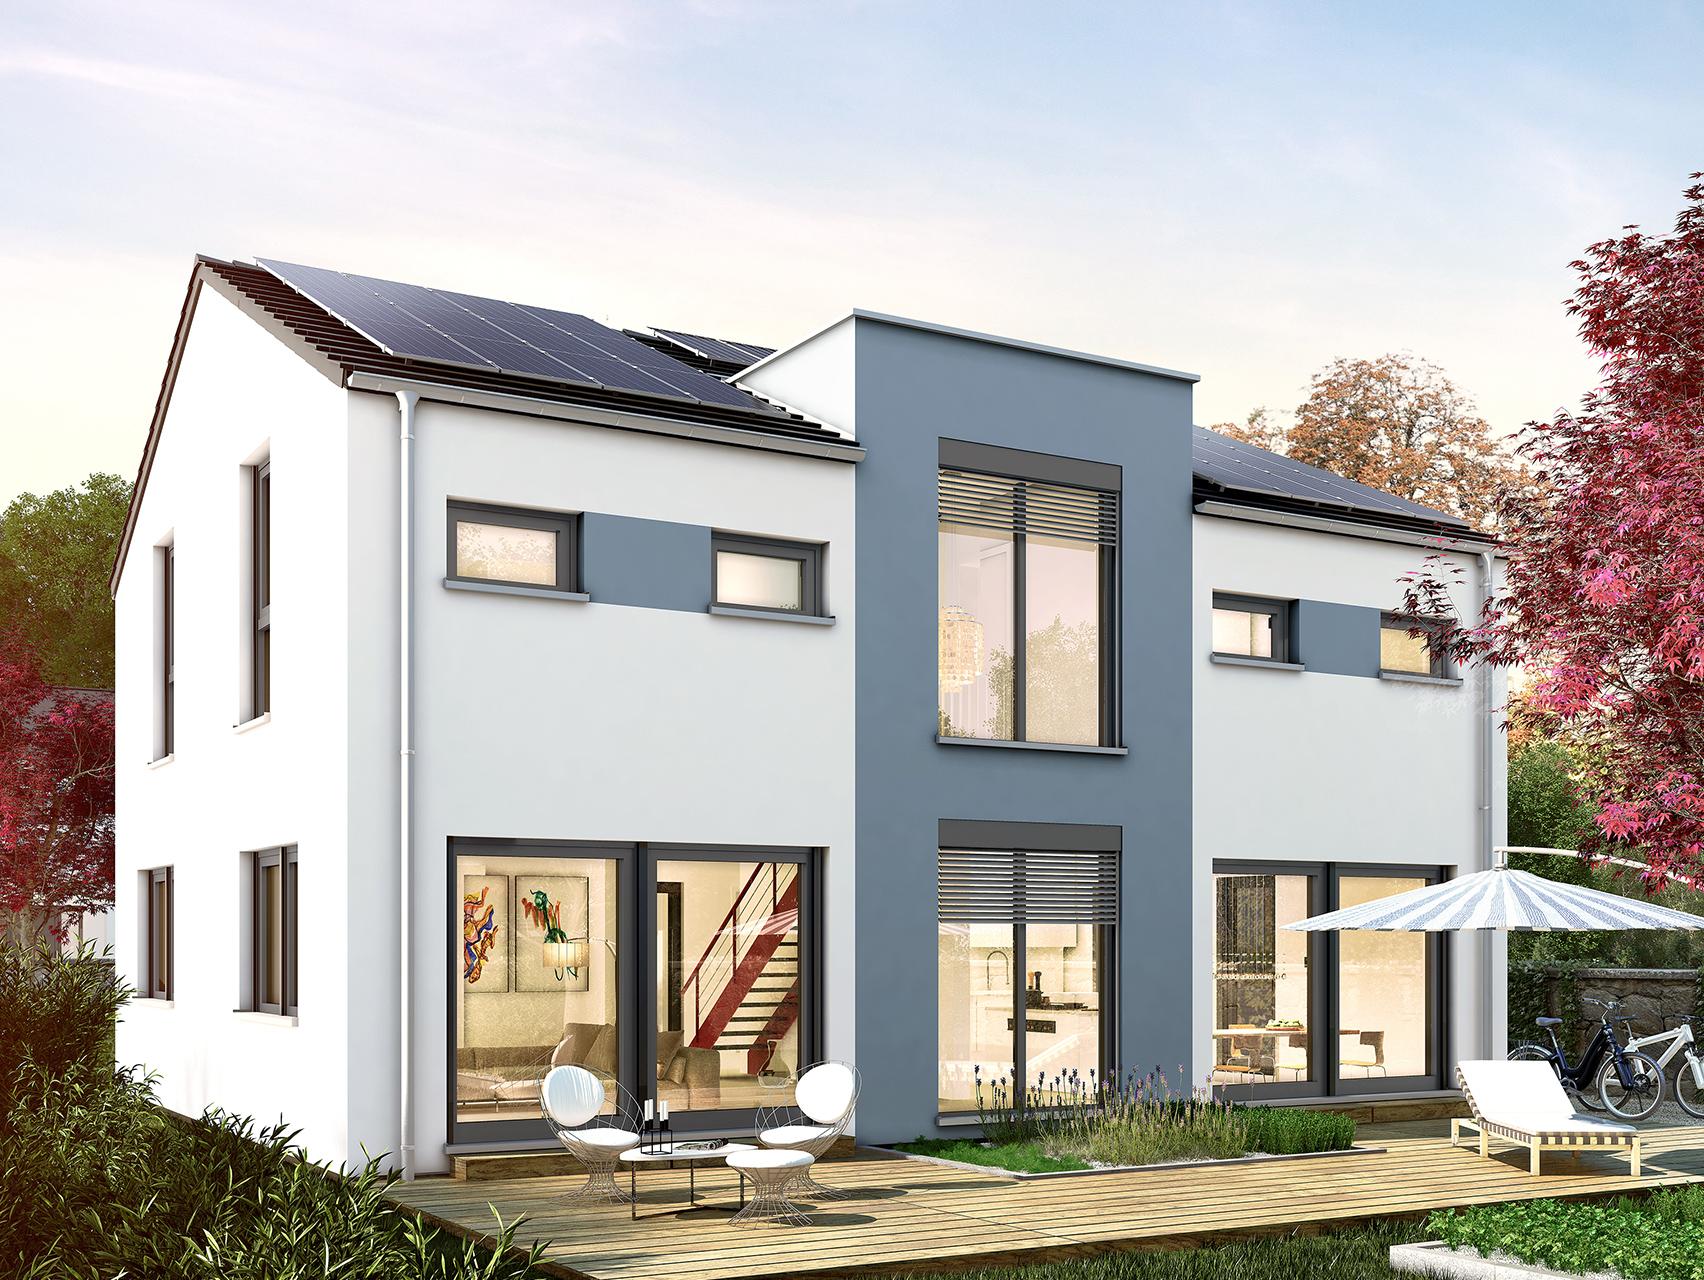 Hausbau - Das Hausbauprojekt